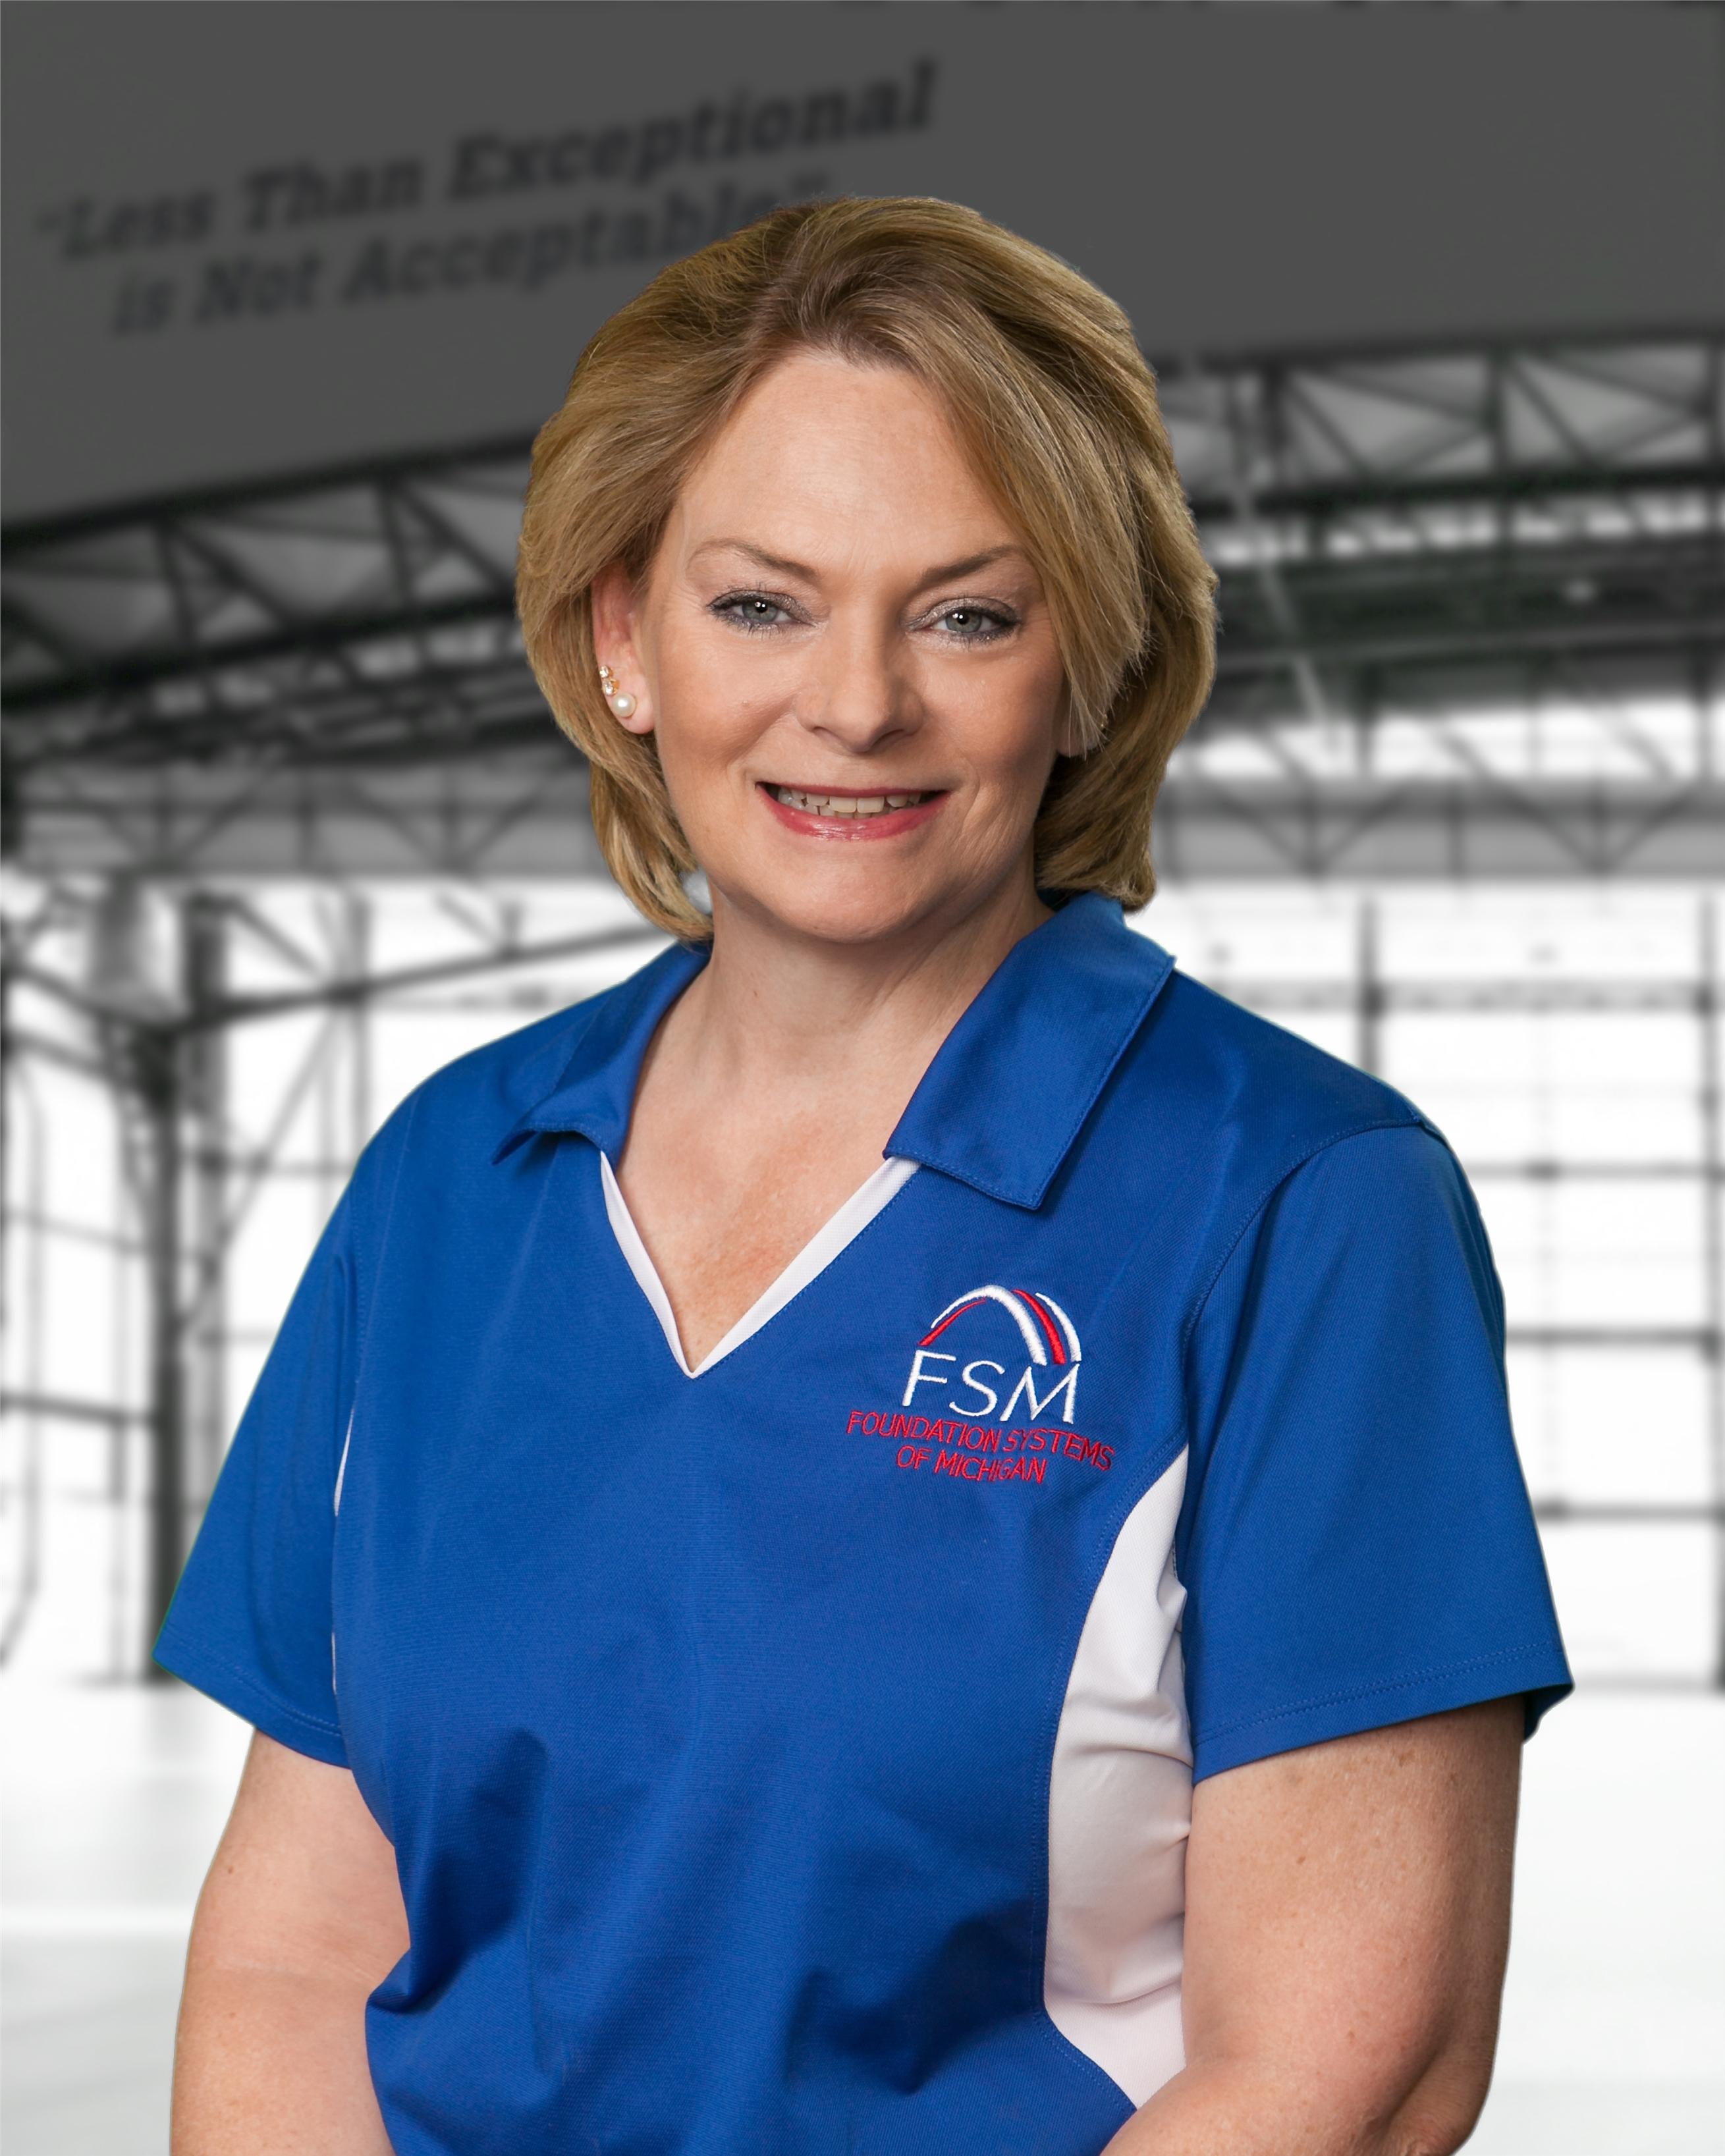 FSM Lynn Curto-Ray Customer Experience Advocate